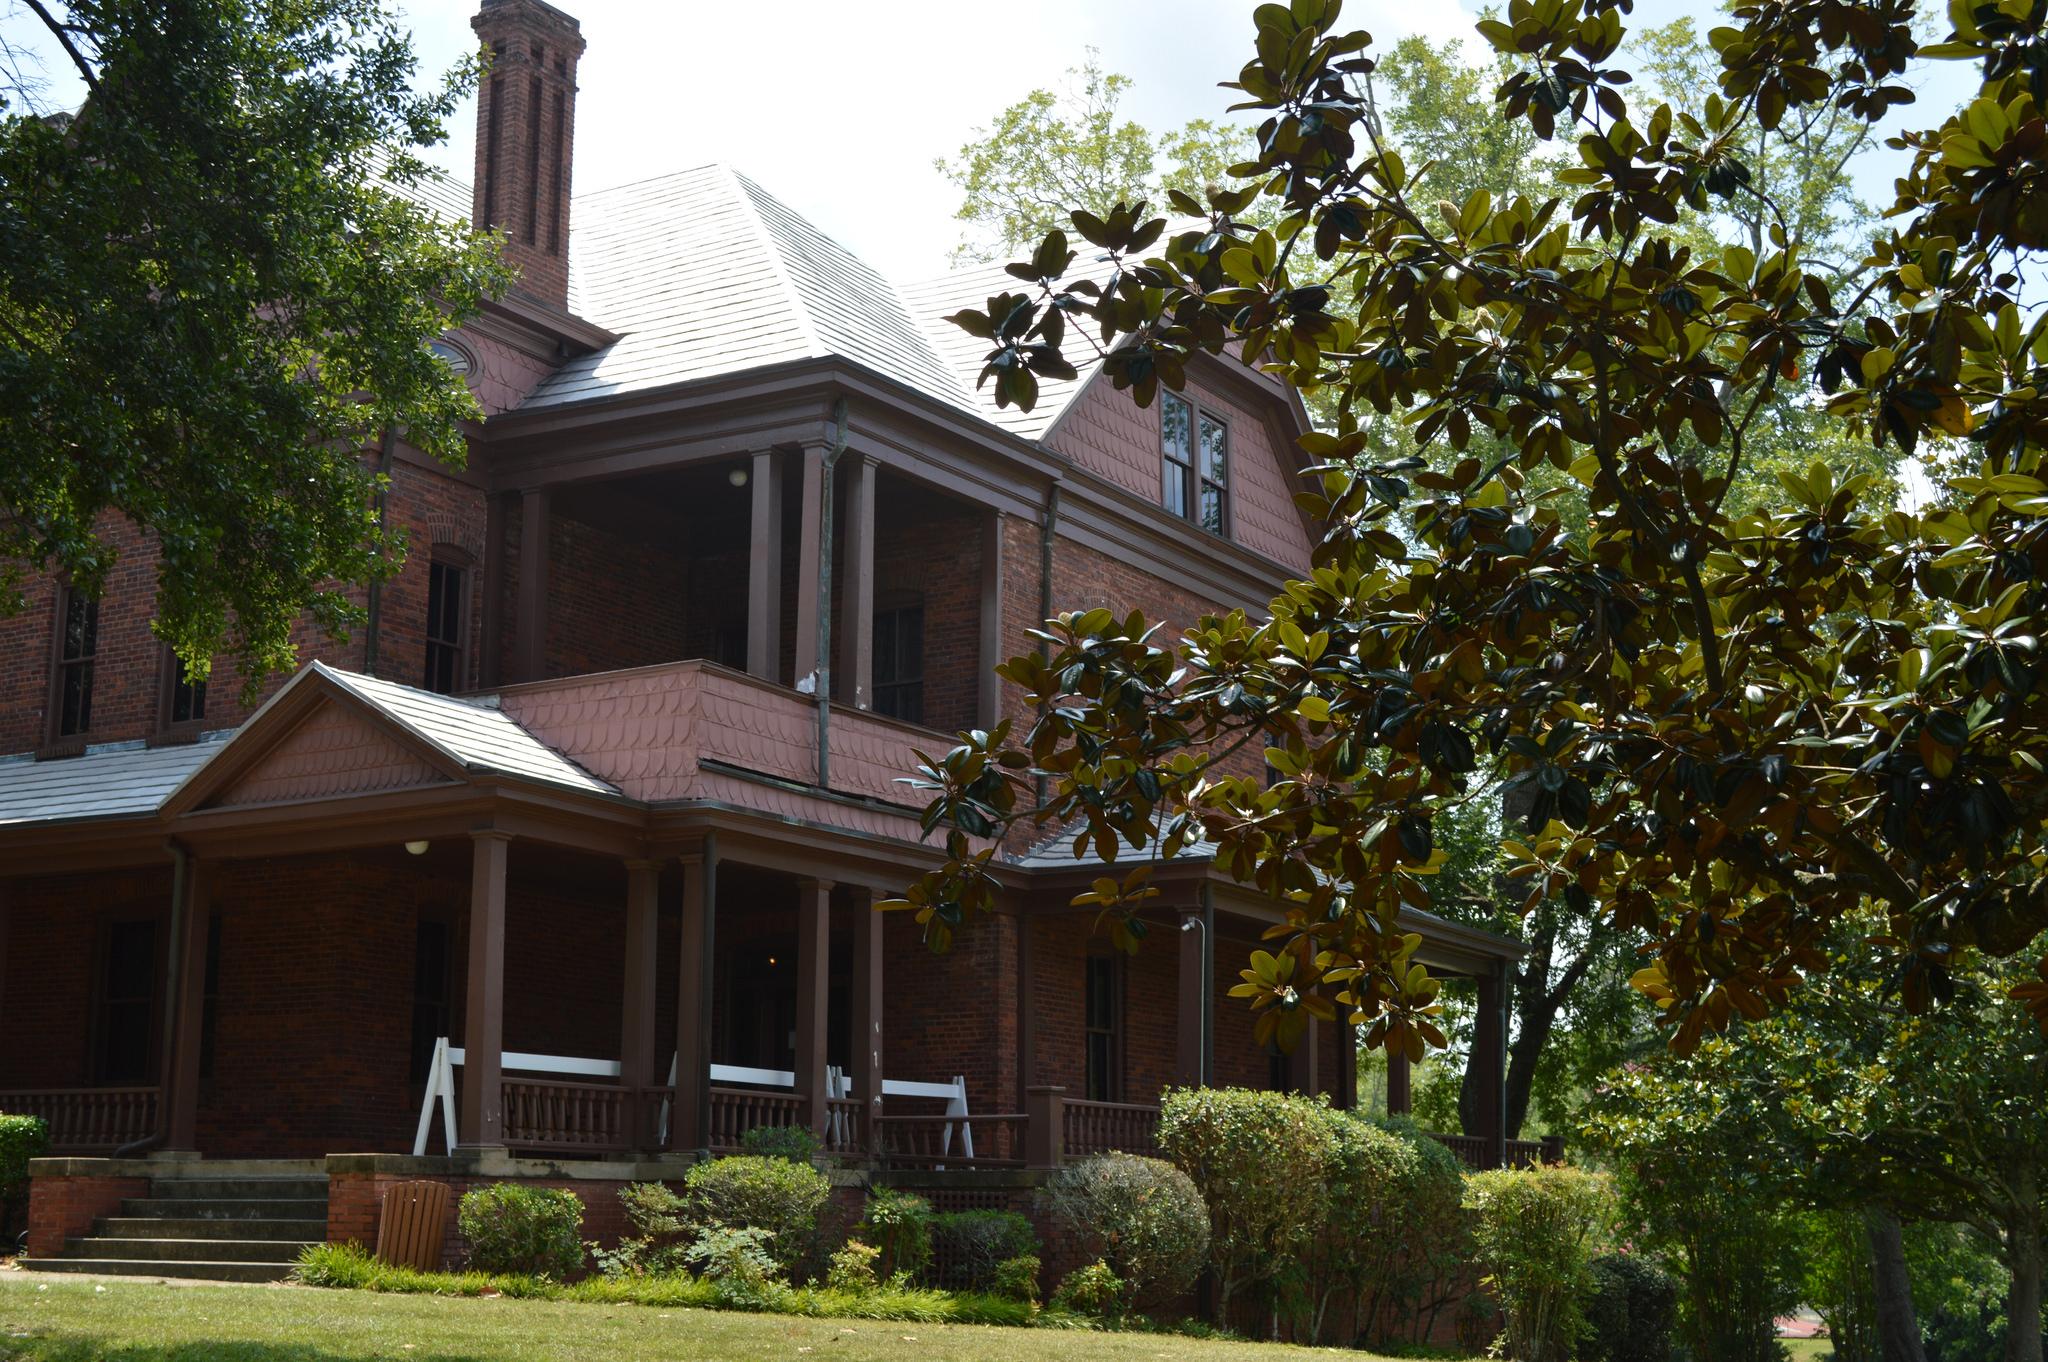 Copy of The Oaks, Tuskegee